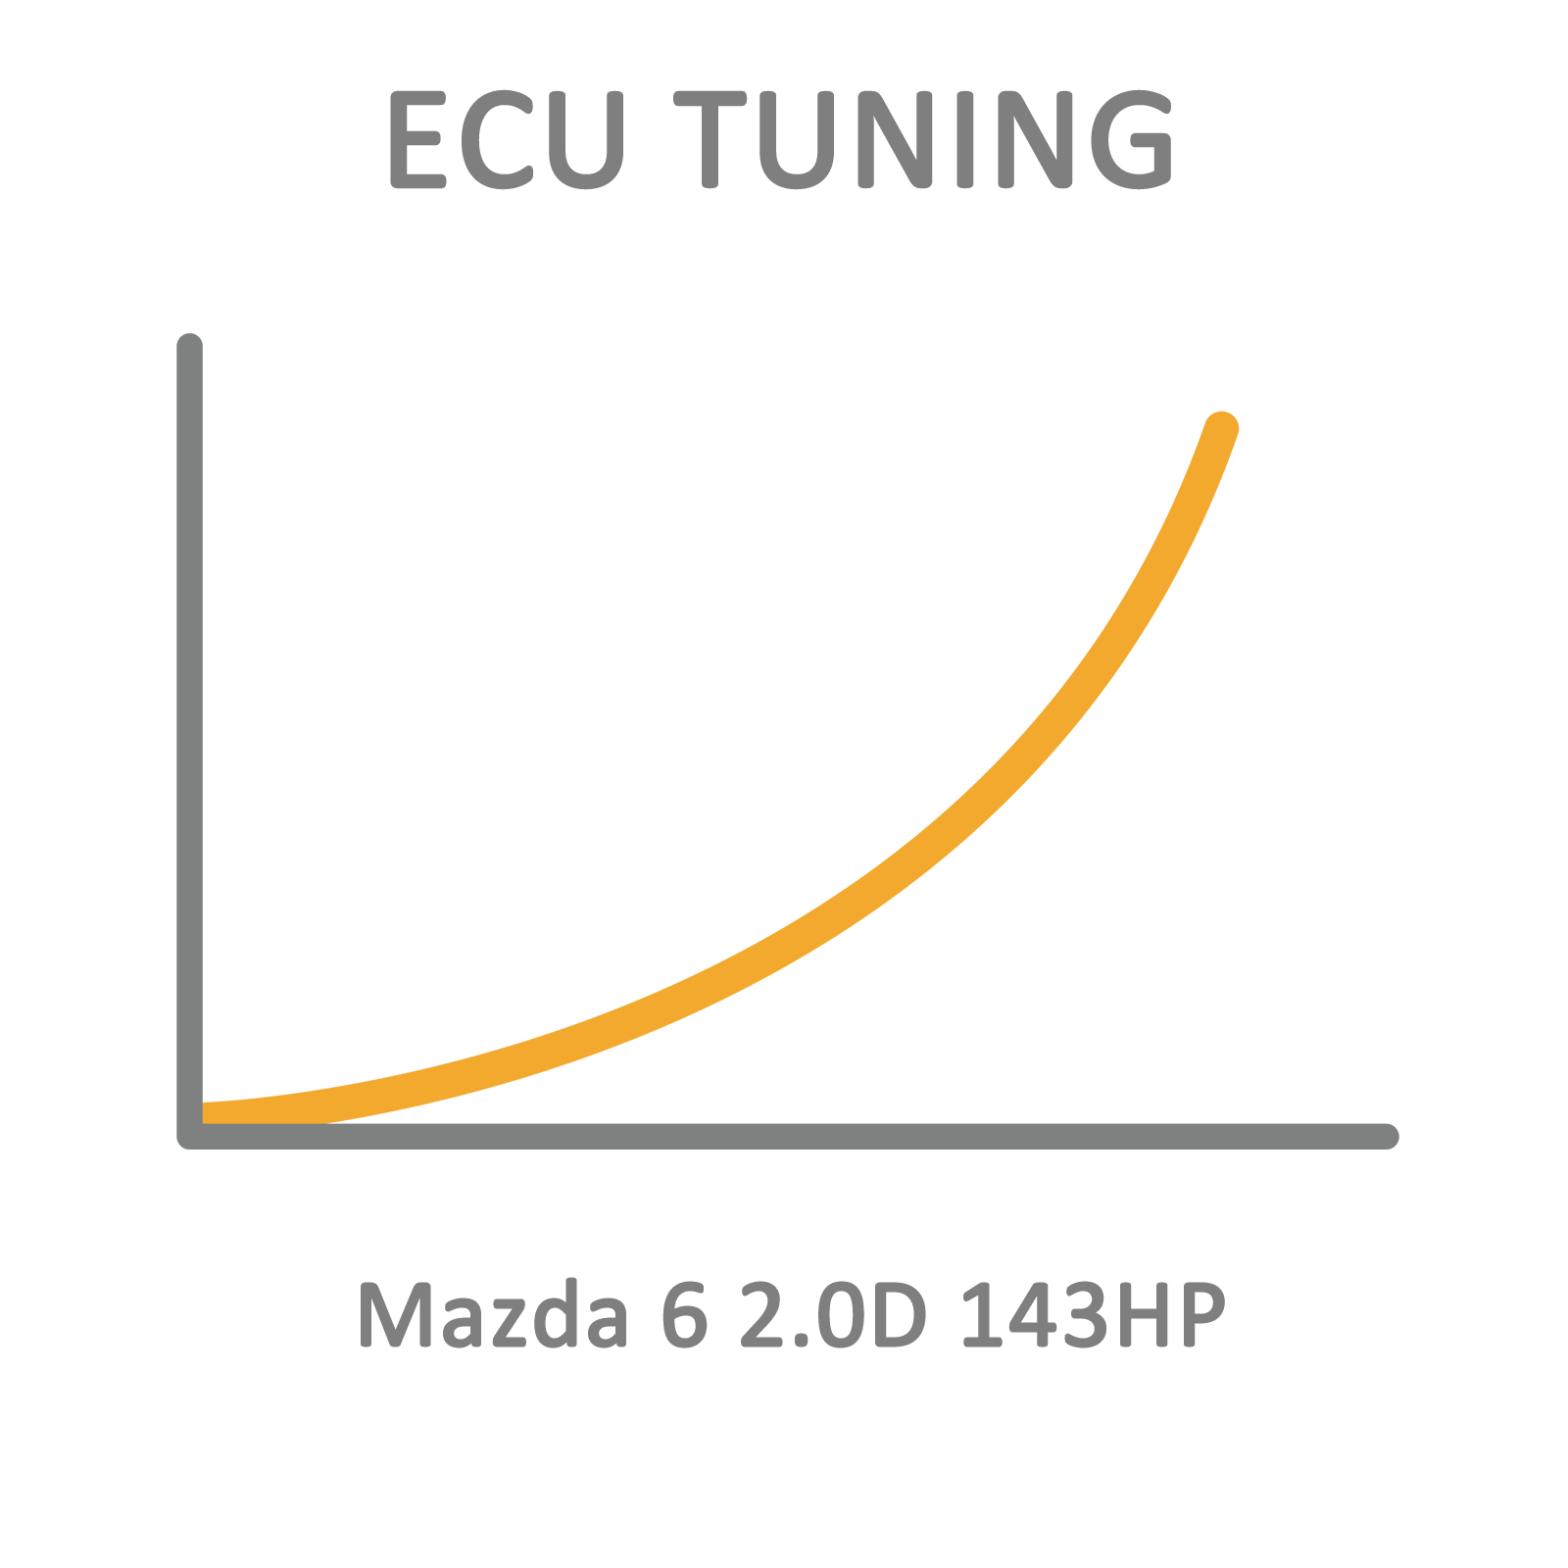 Mazda 6 2.0D 143HP ECU Tuning Remapping Programming